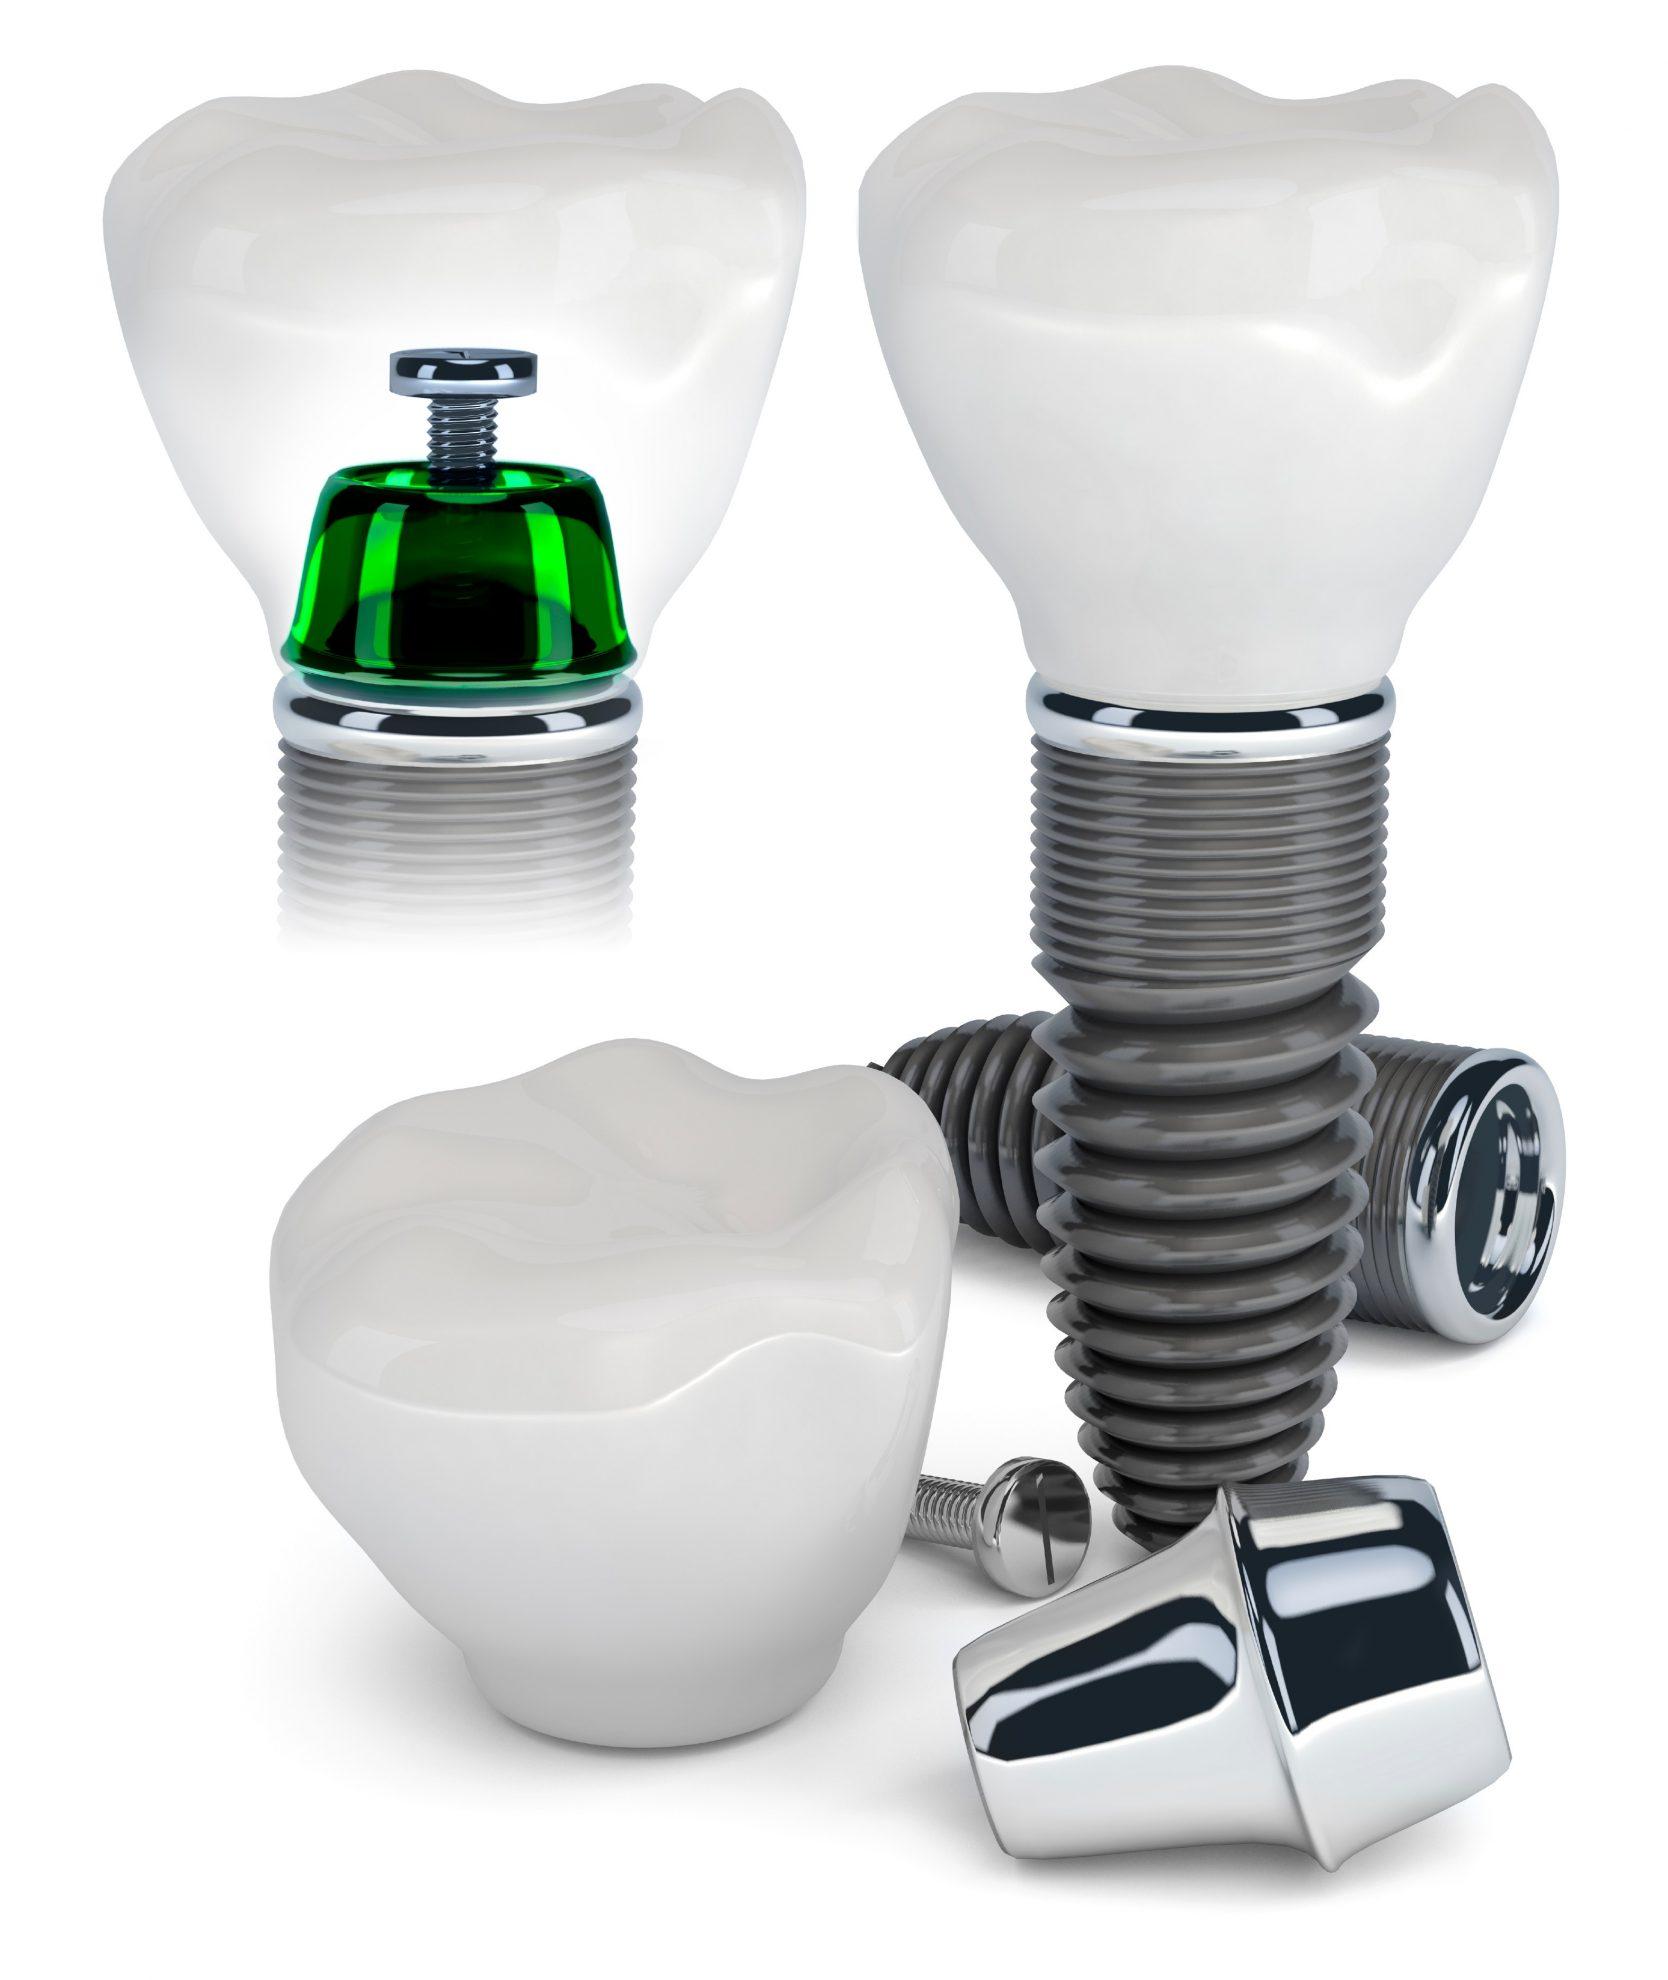 tarif implant dentaire hongrie